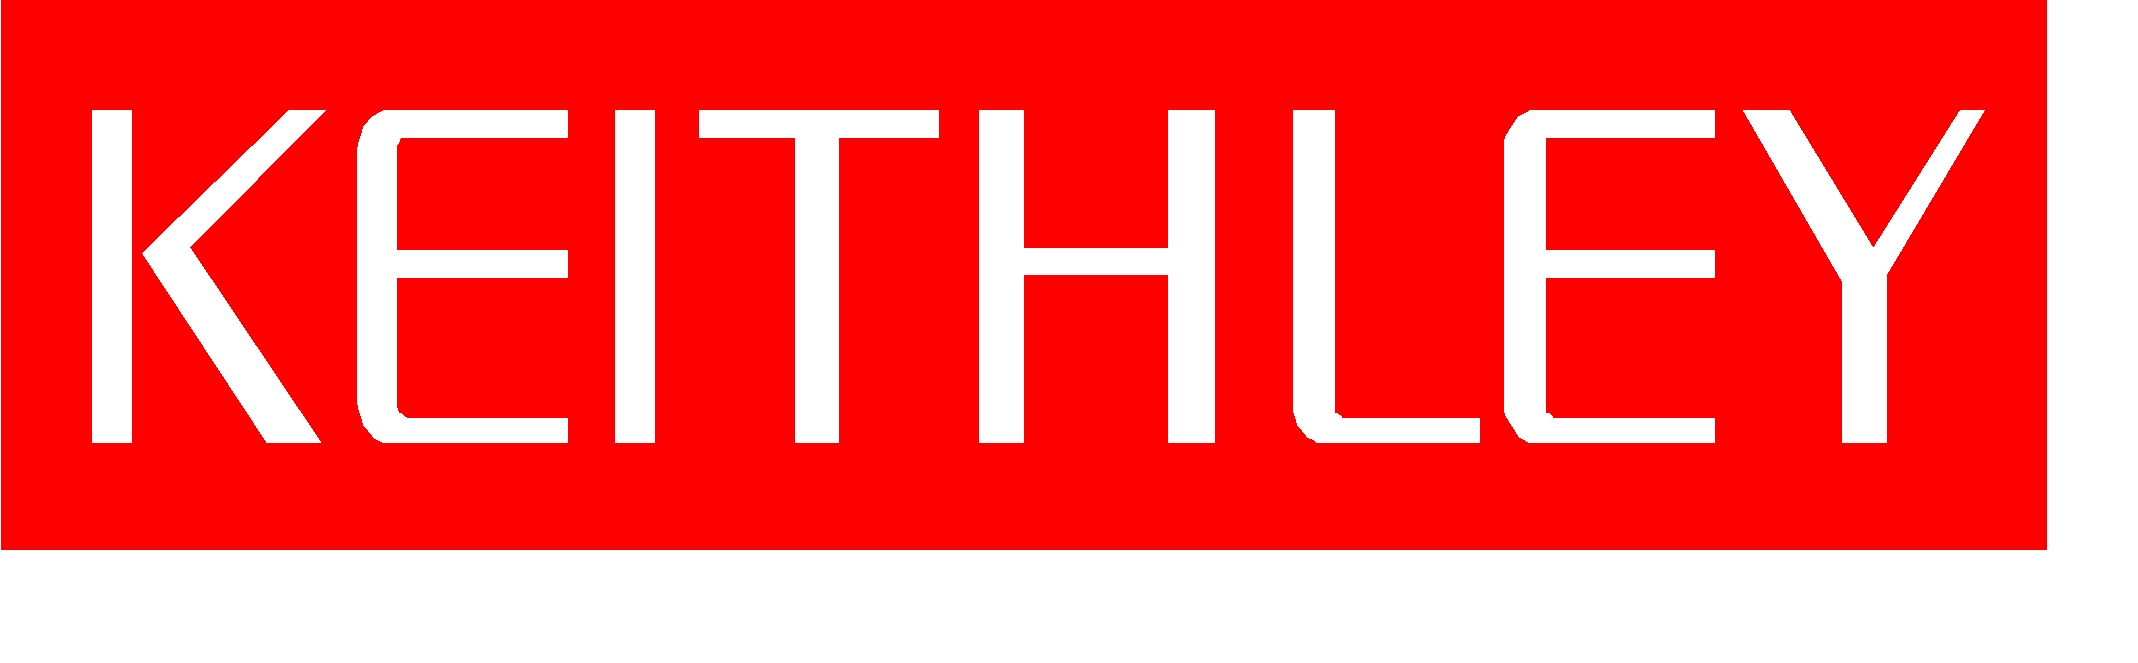 Keithley logo